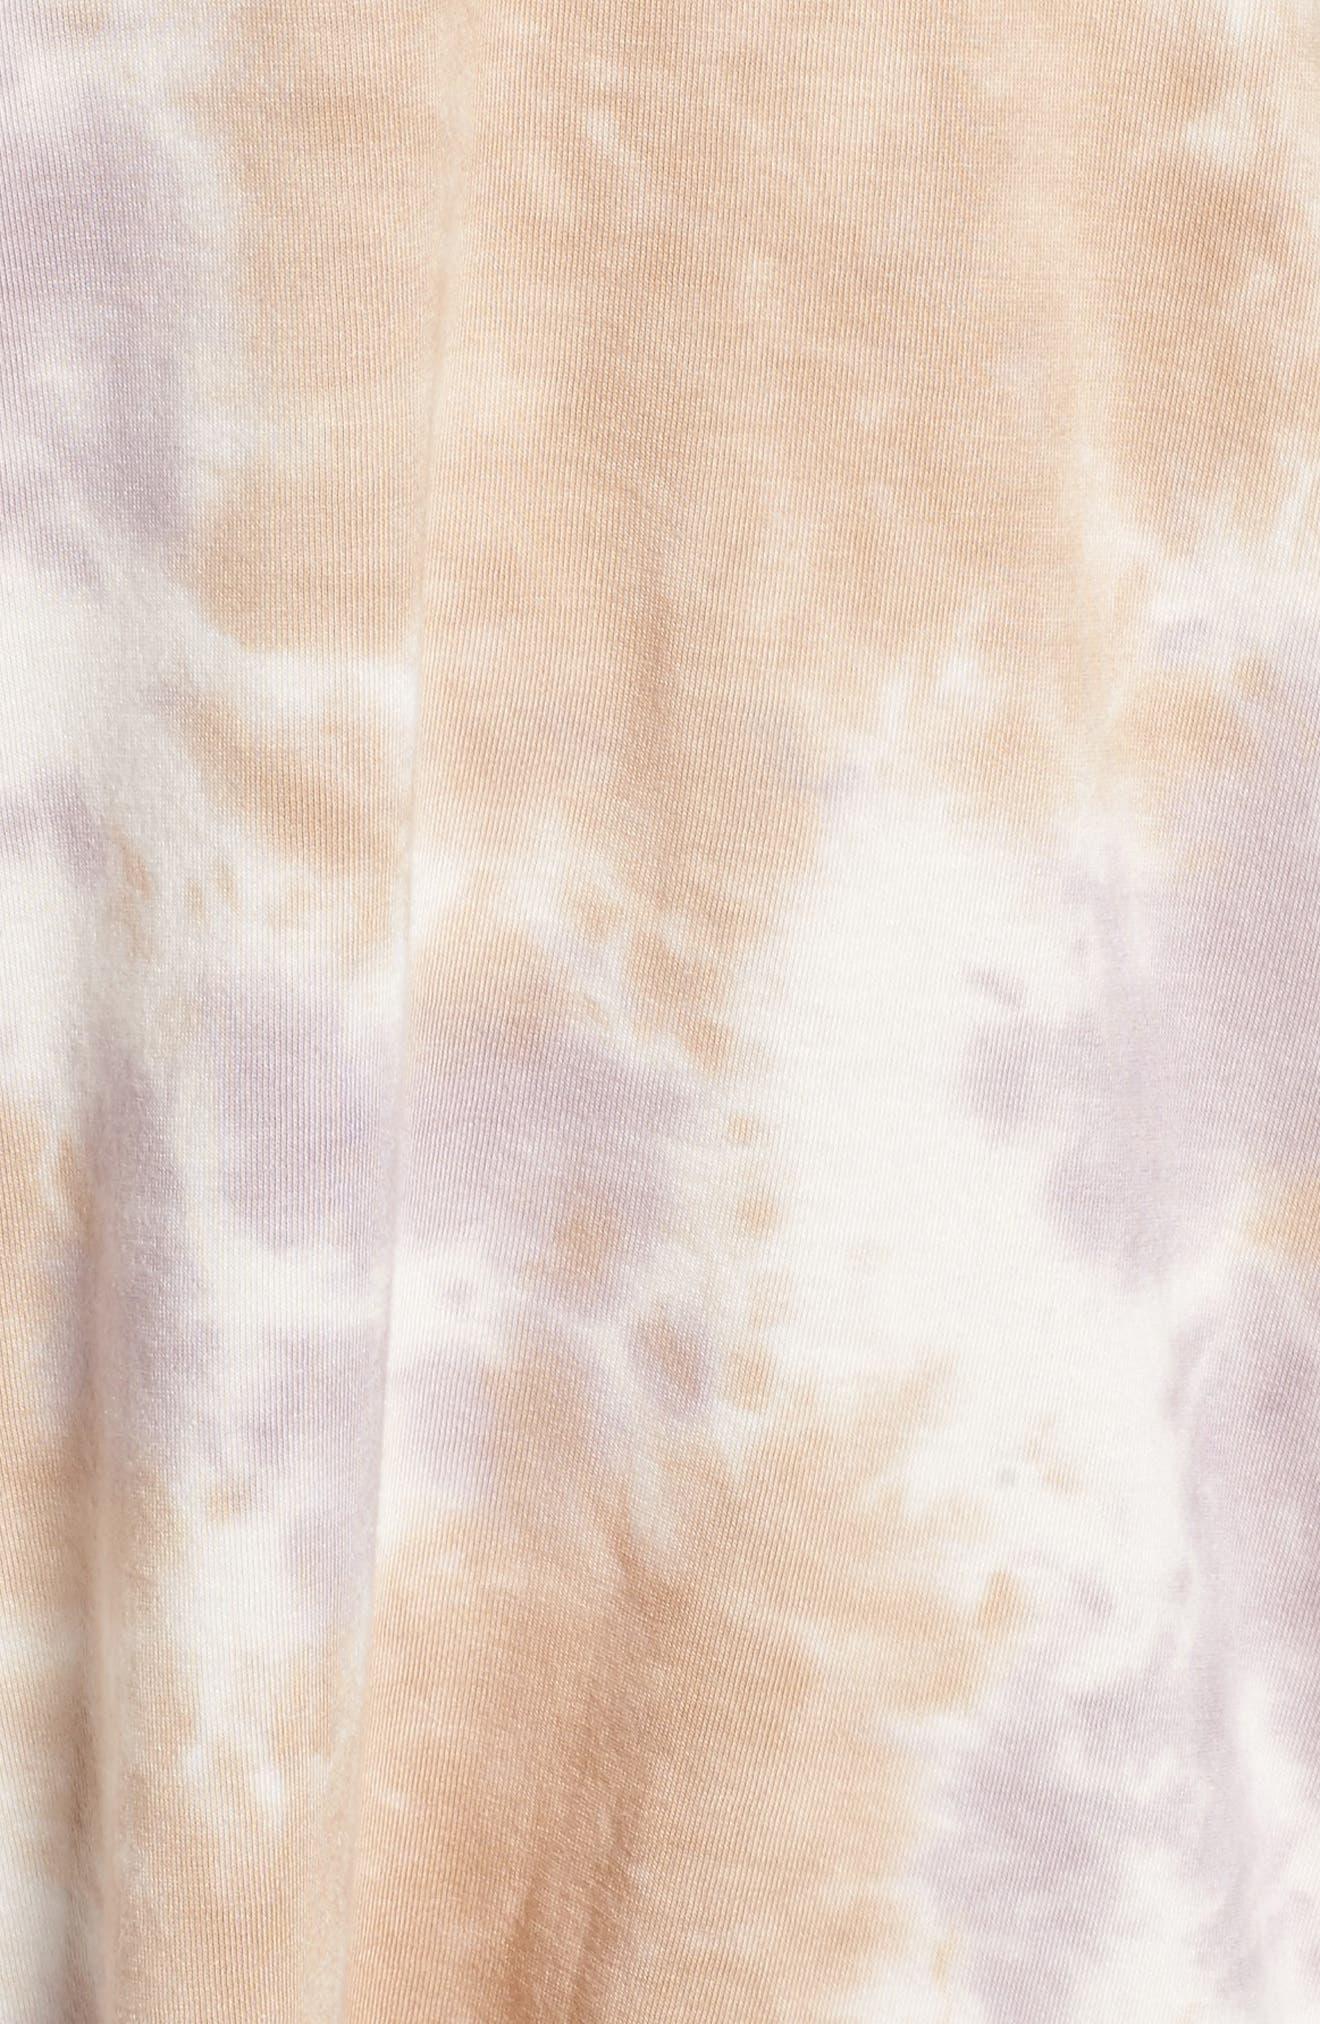 Kara Knit Chemise,                             Alternate thumbnail 6, color,                             Ash Violet